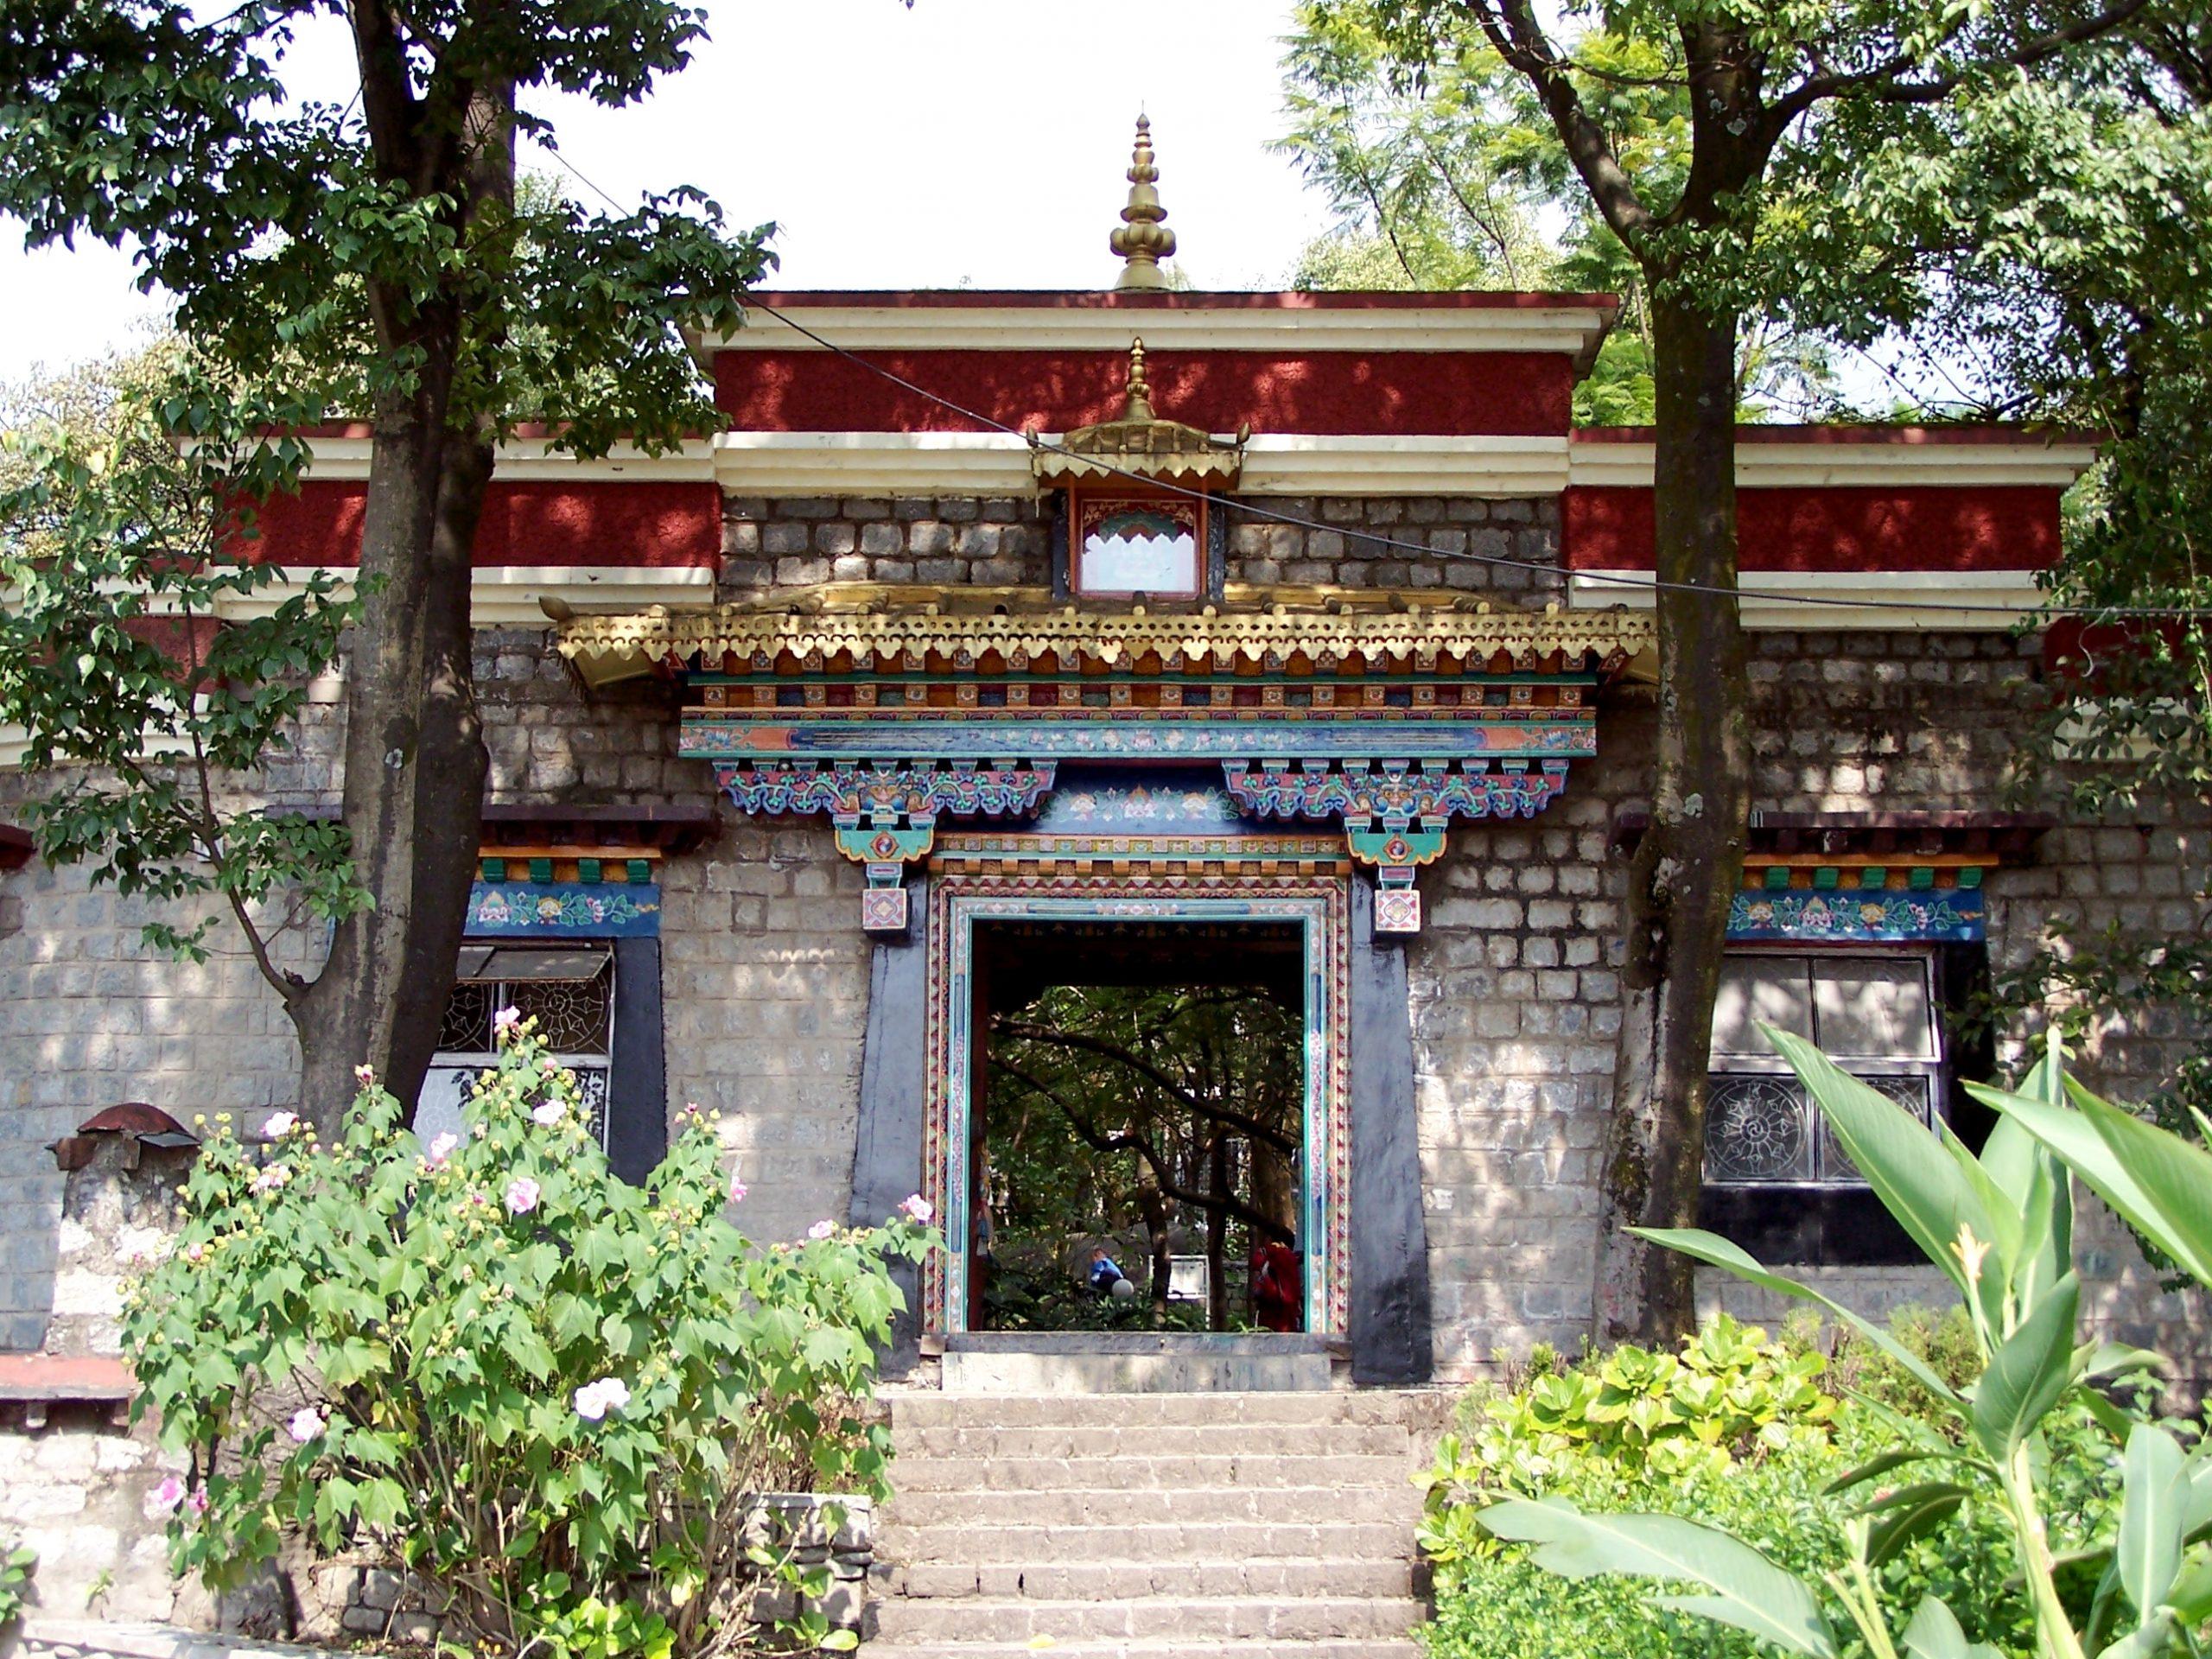 Norbulingka Institute - Must-Visit Place in Dharamshala and McLeodganj